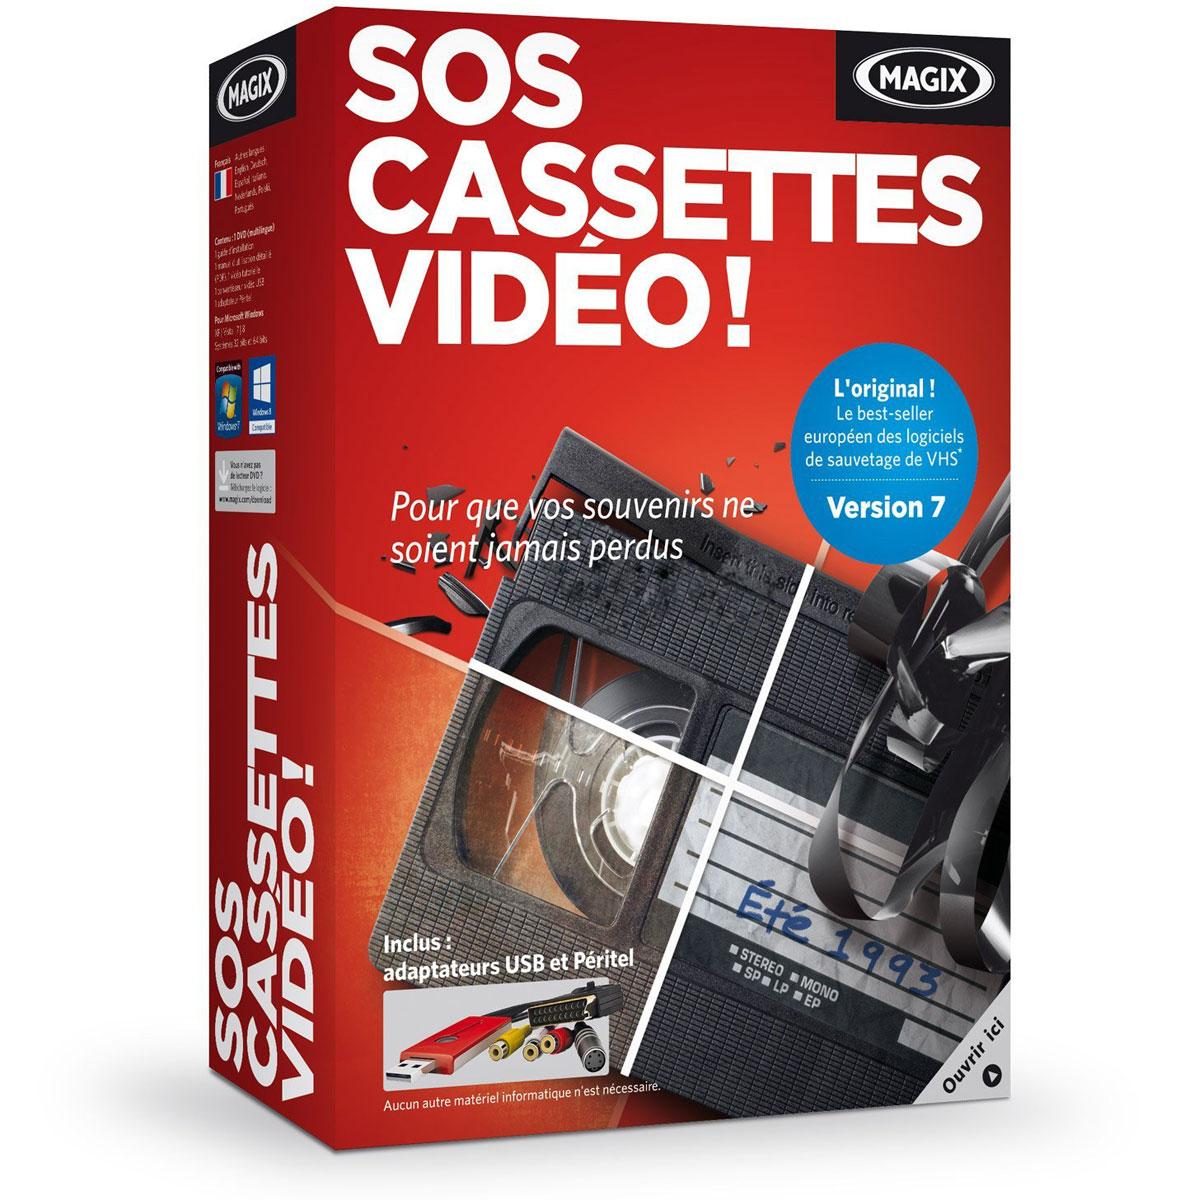 magix sos cassettes video 7 logiciel image son magix sur. Black Bedroom Furniture Sets. Home Design Ideas